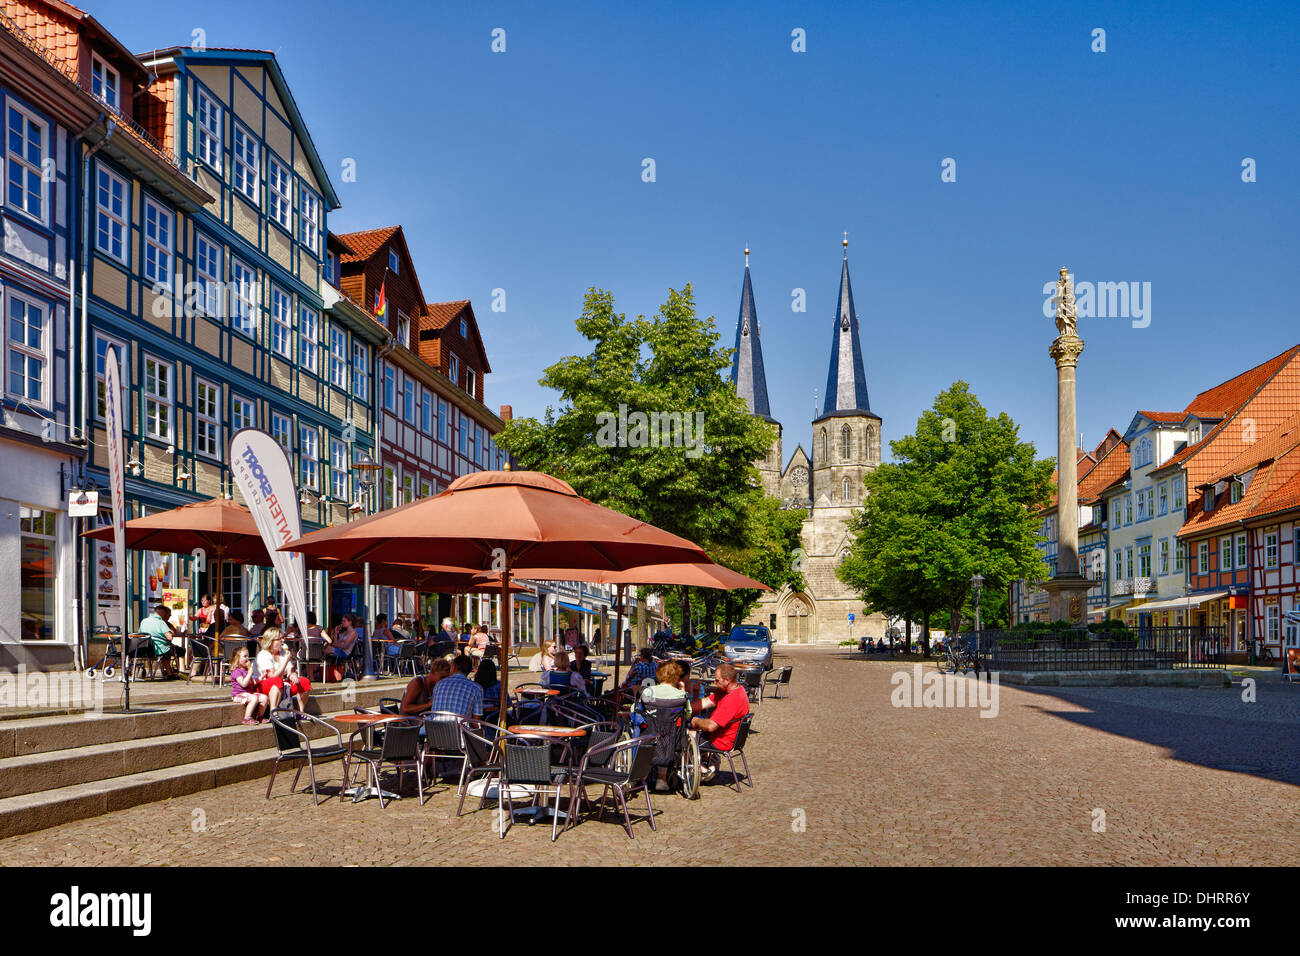 Sidewalk Cafe and St. Cyriakus church, Duderstadt, Germany - Stock Image